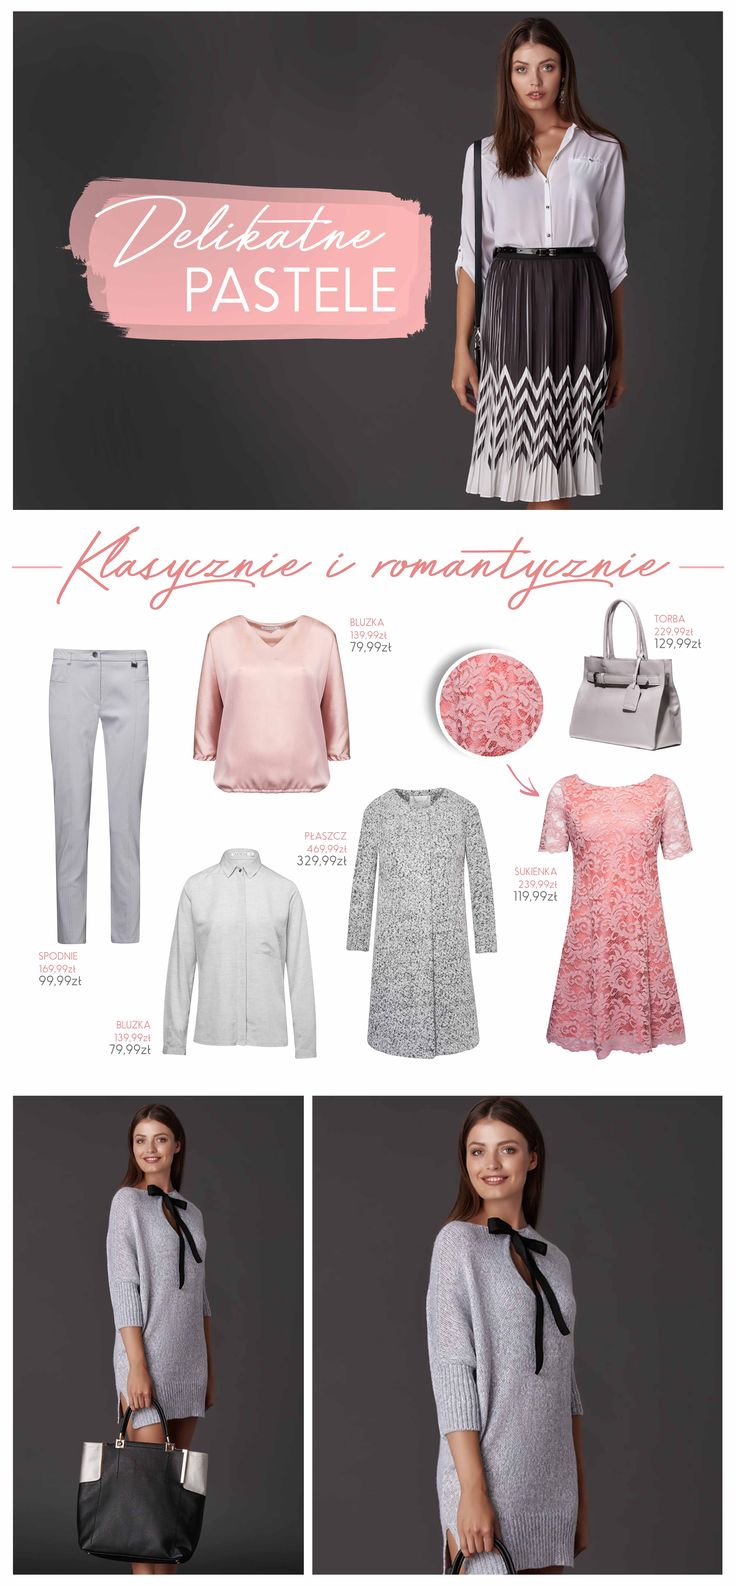 #naszainspiracja #ootd #pastele #trousers #blouse #dress #bag #woman #womanwear #fashion #polishfashion